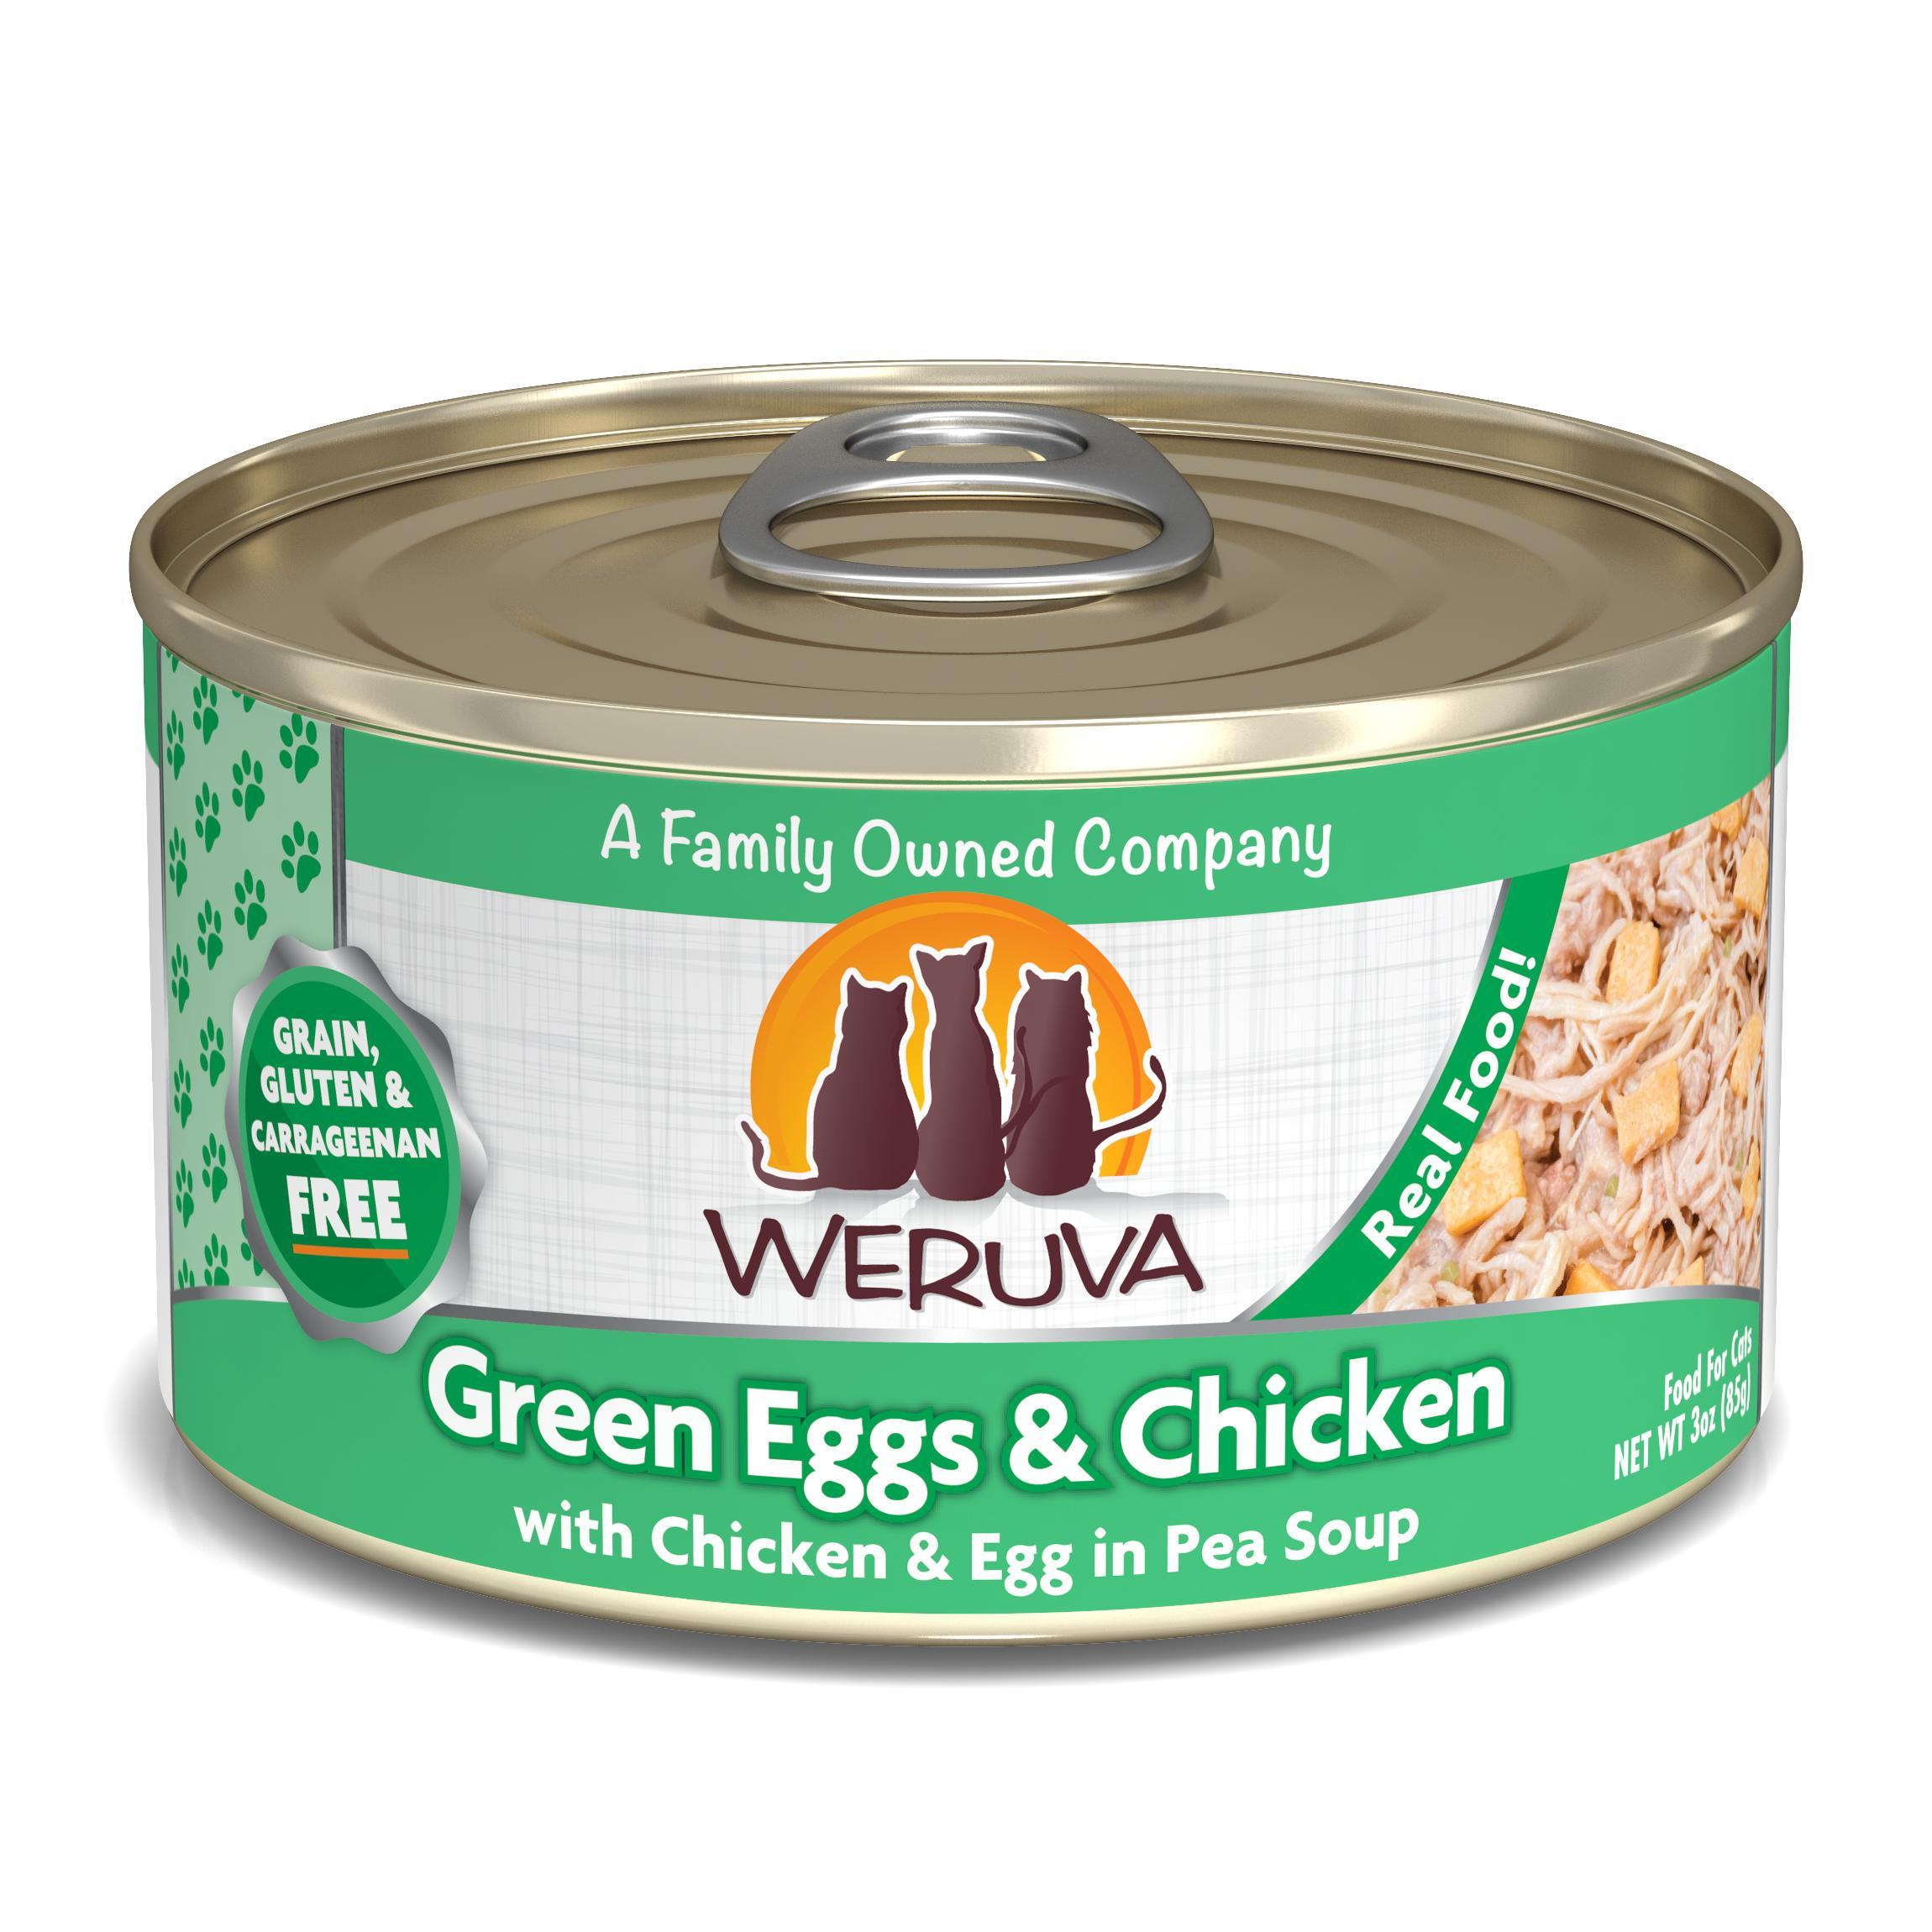 Weruva Cat Classic Green Eggs & Chicken with Chicken, Egg & Greens in Gravy Grain-Free Wet Cat Food Image